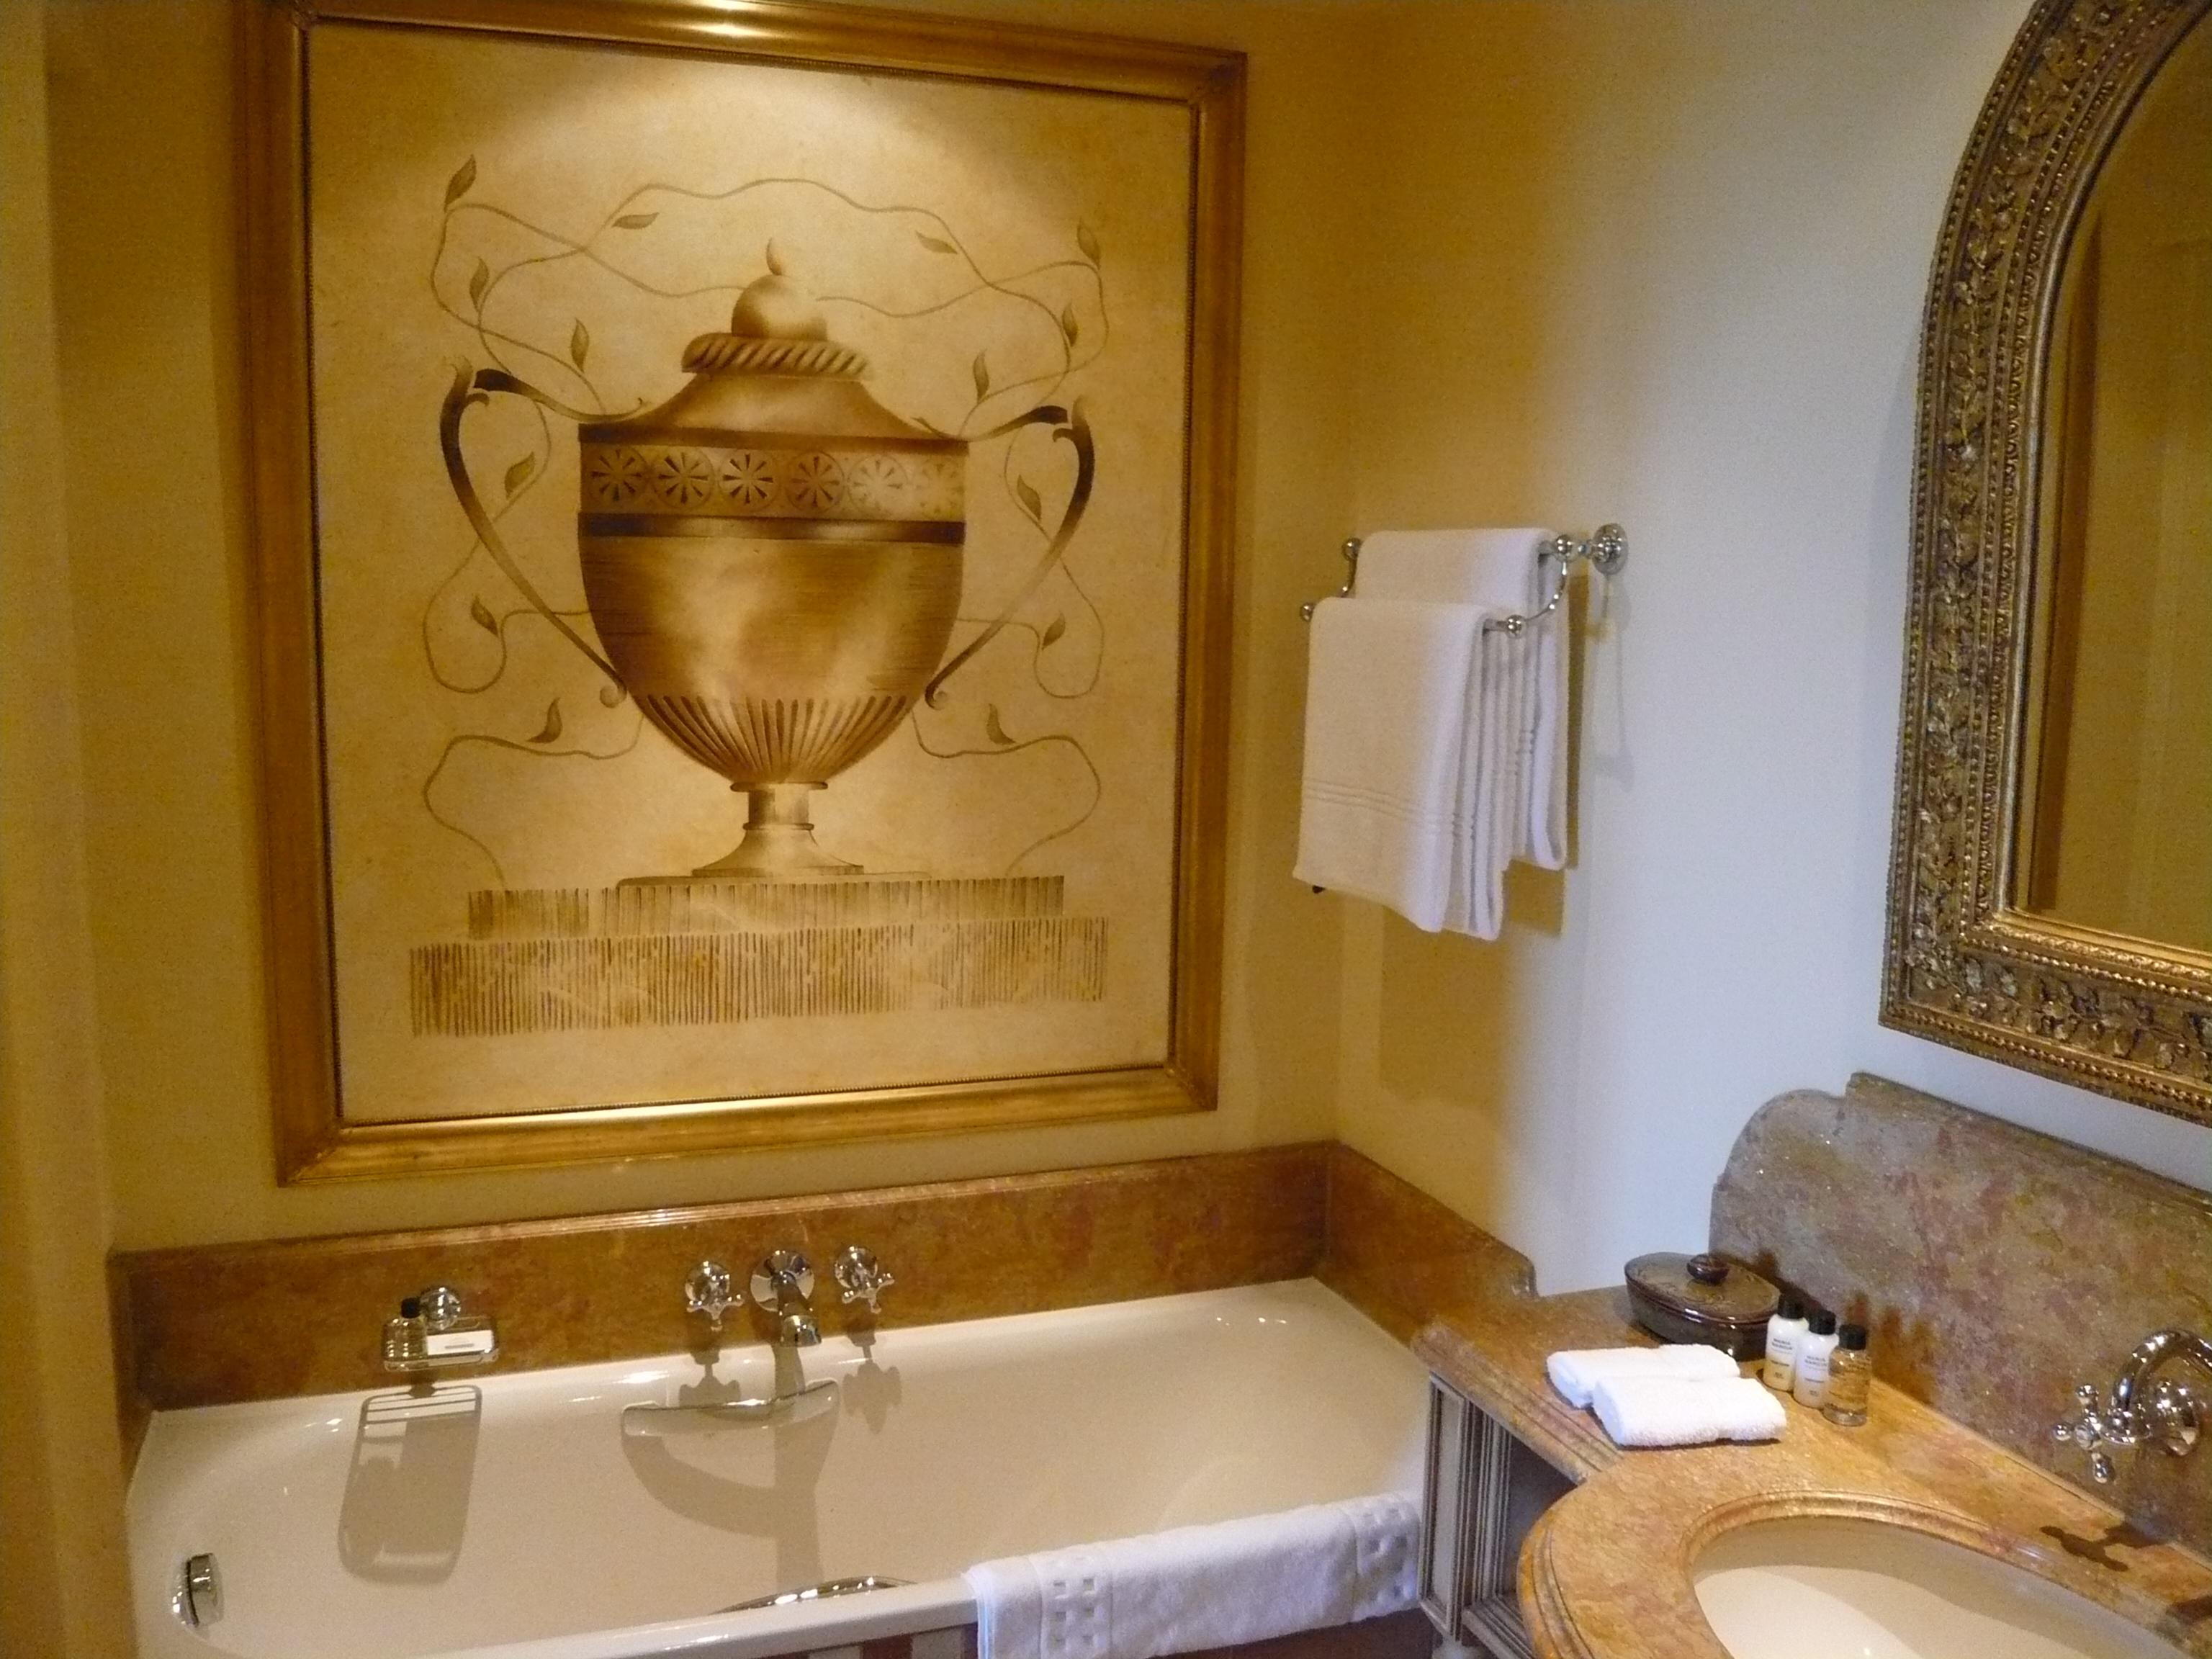 Palazzo Hotel Rooms Las Vegas